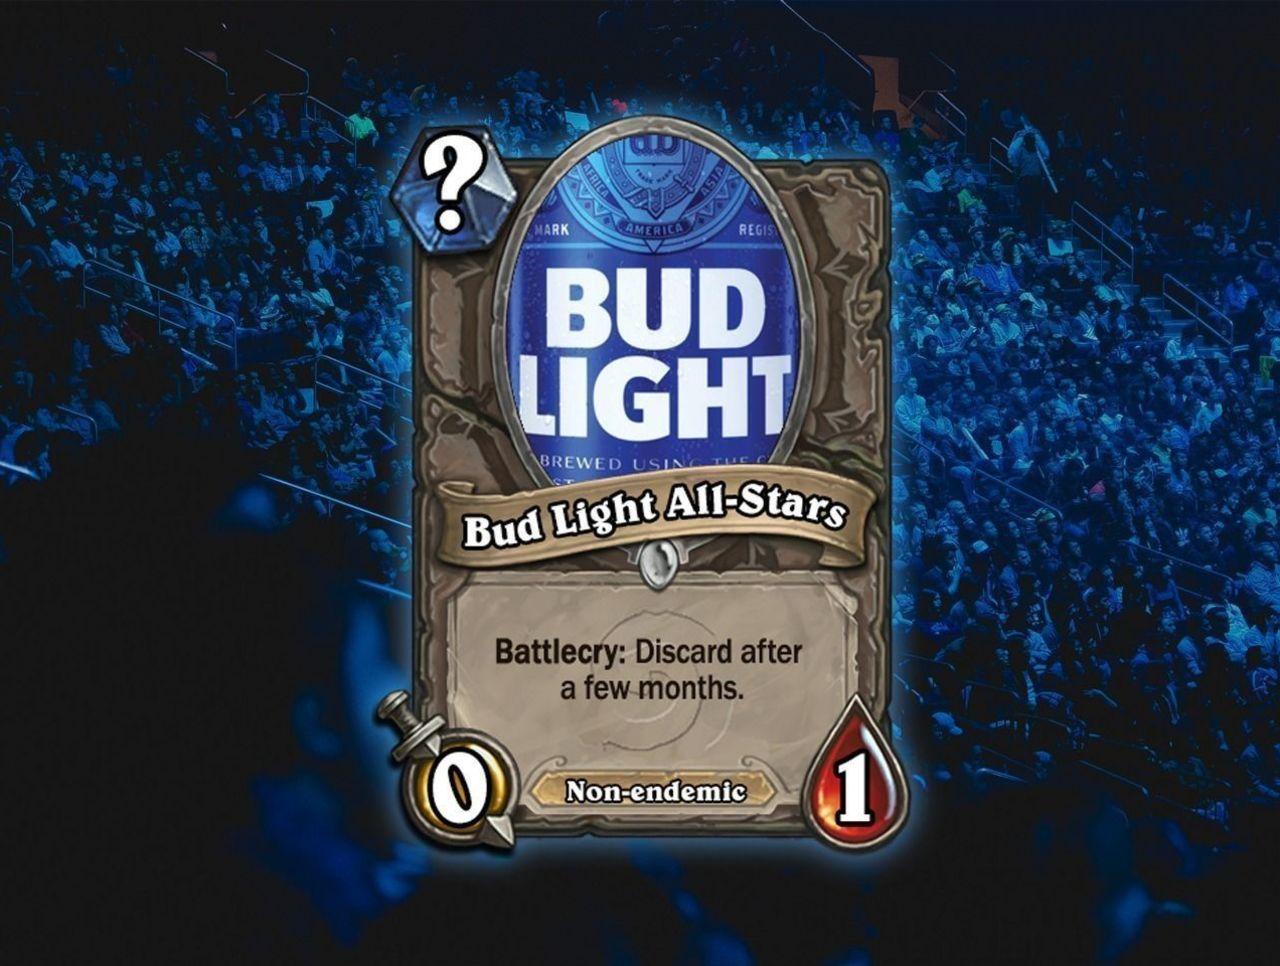 Esports meets mainstream: Looking back on Bud Light's failed